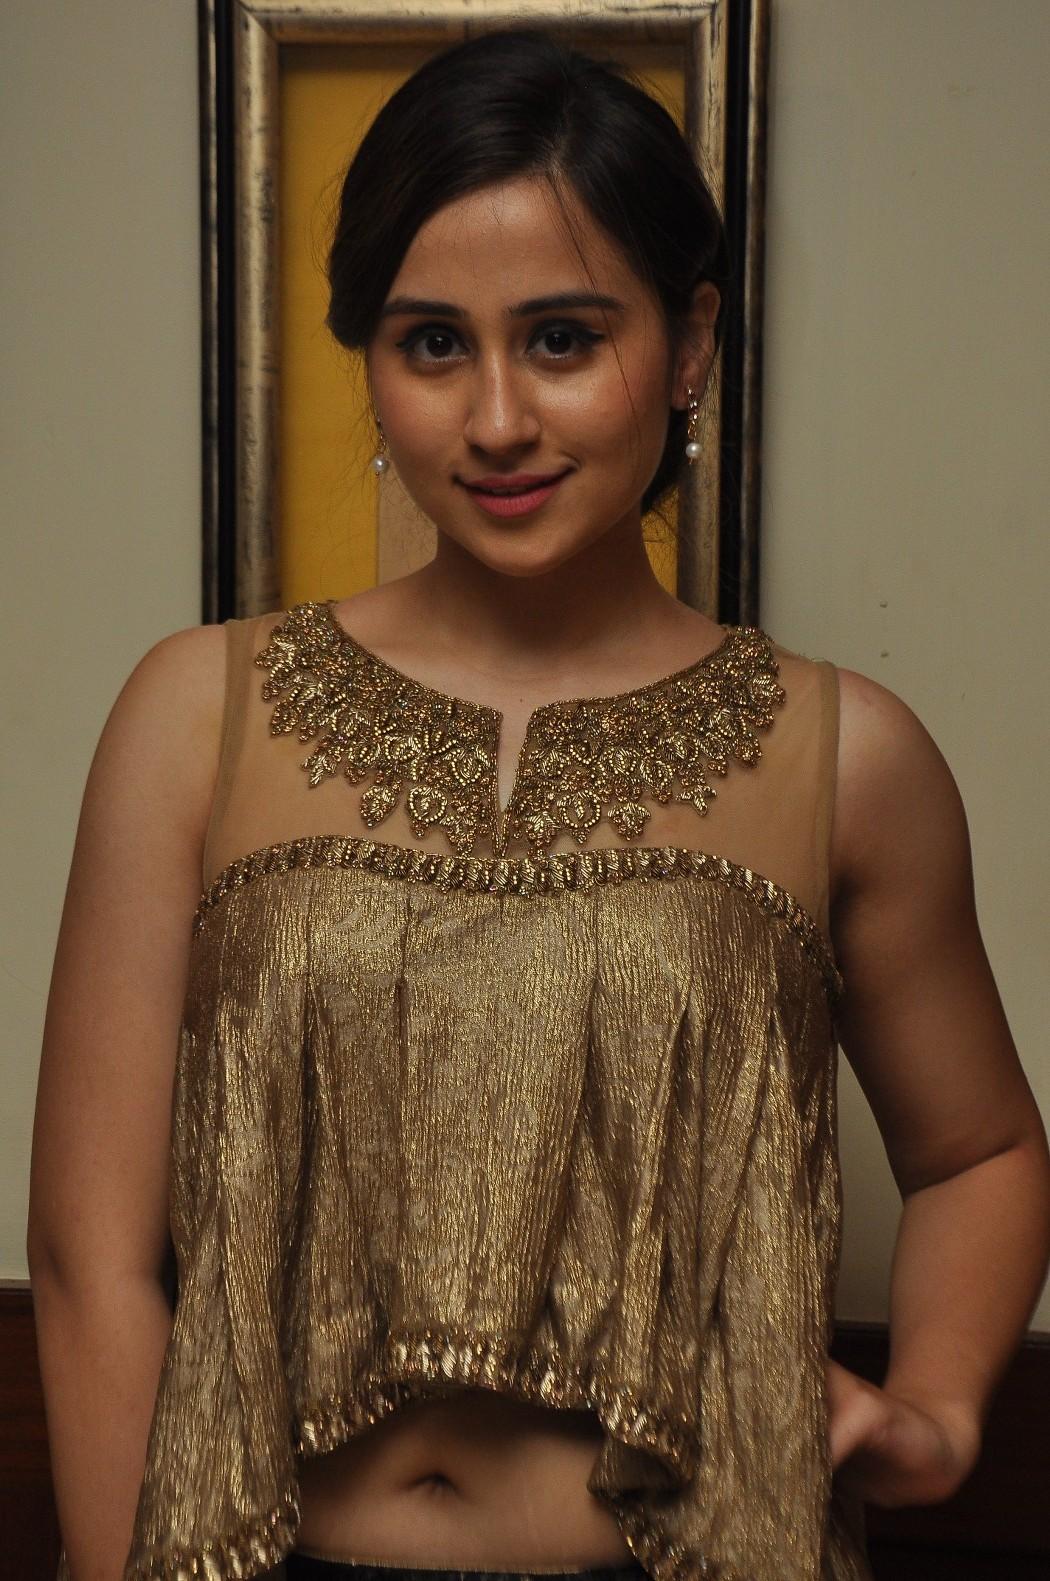 Love For Handloom Celebs and Models Dazzle In Elegant Outfit   Love For Handloom Praneetha Love For Handloom 478